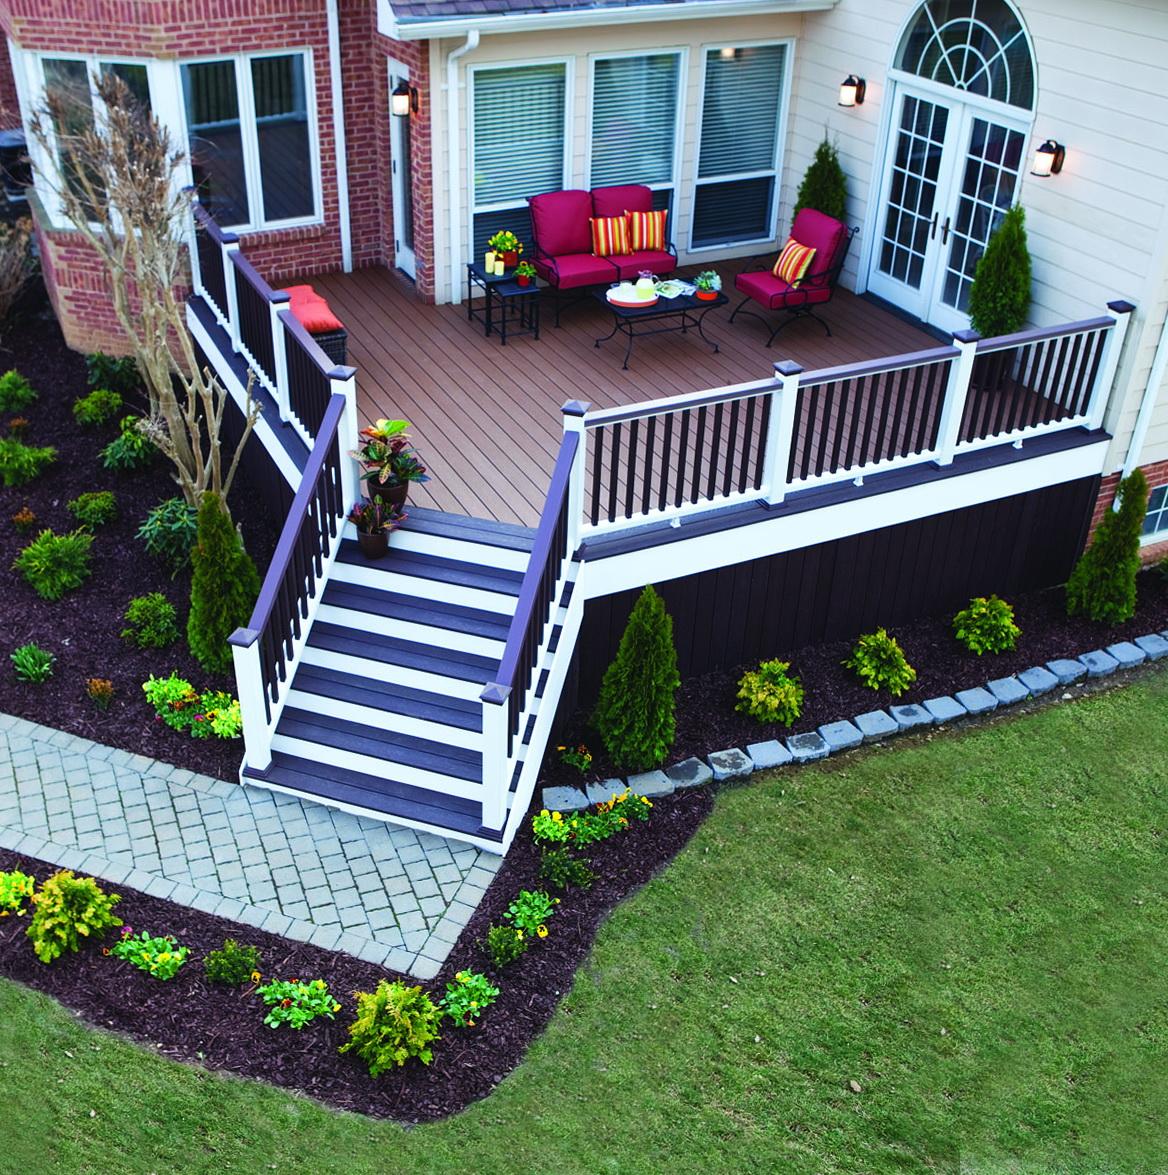 Trex decking colors pdf home design ideas for Composite decking colors